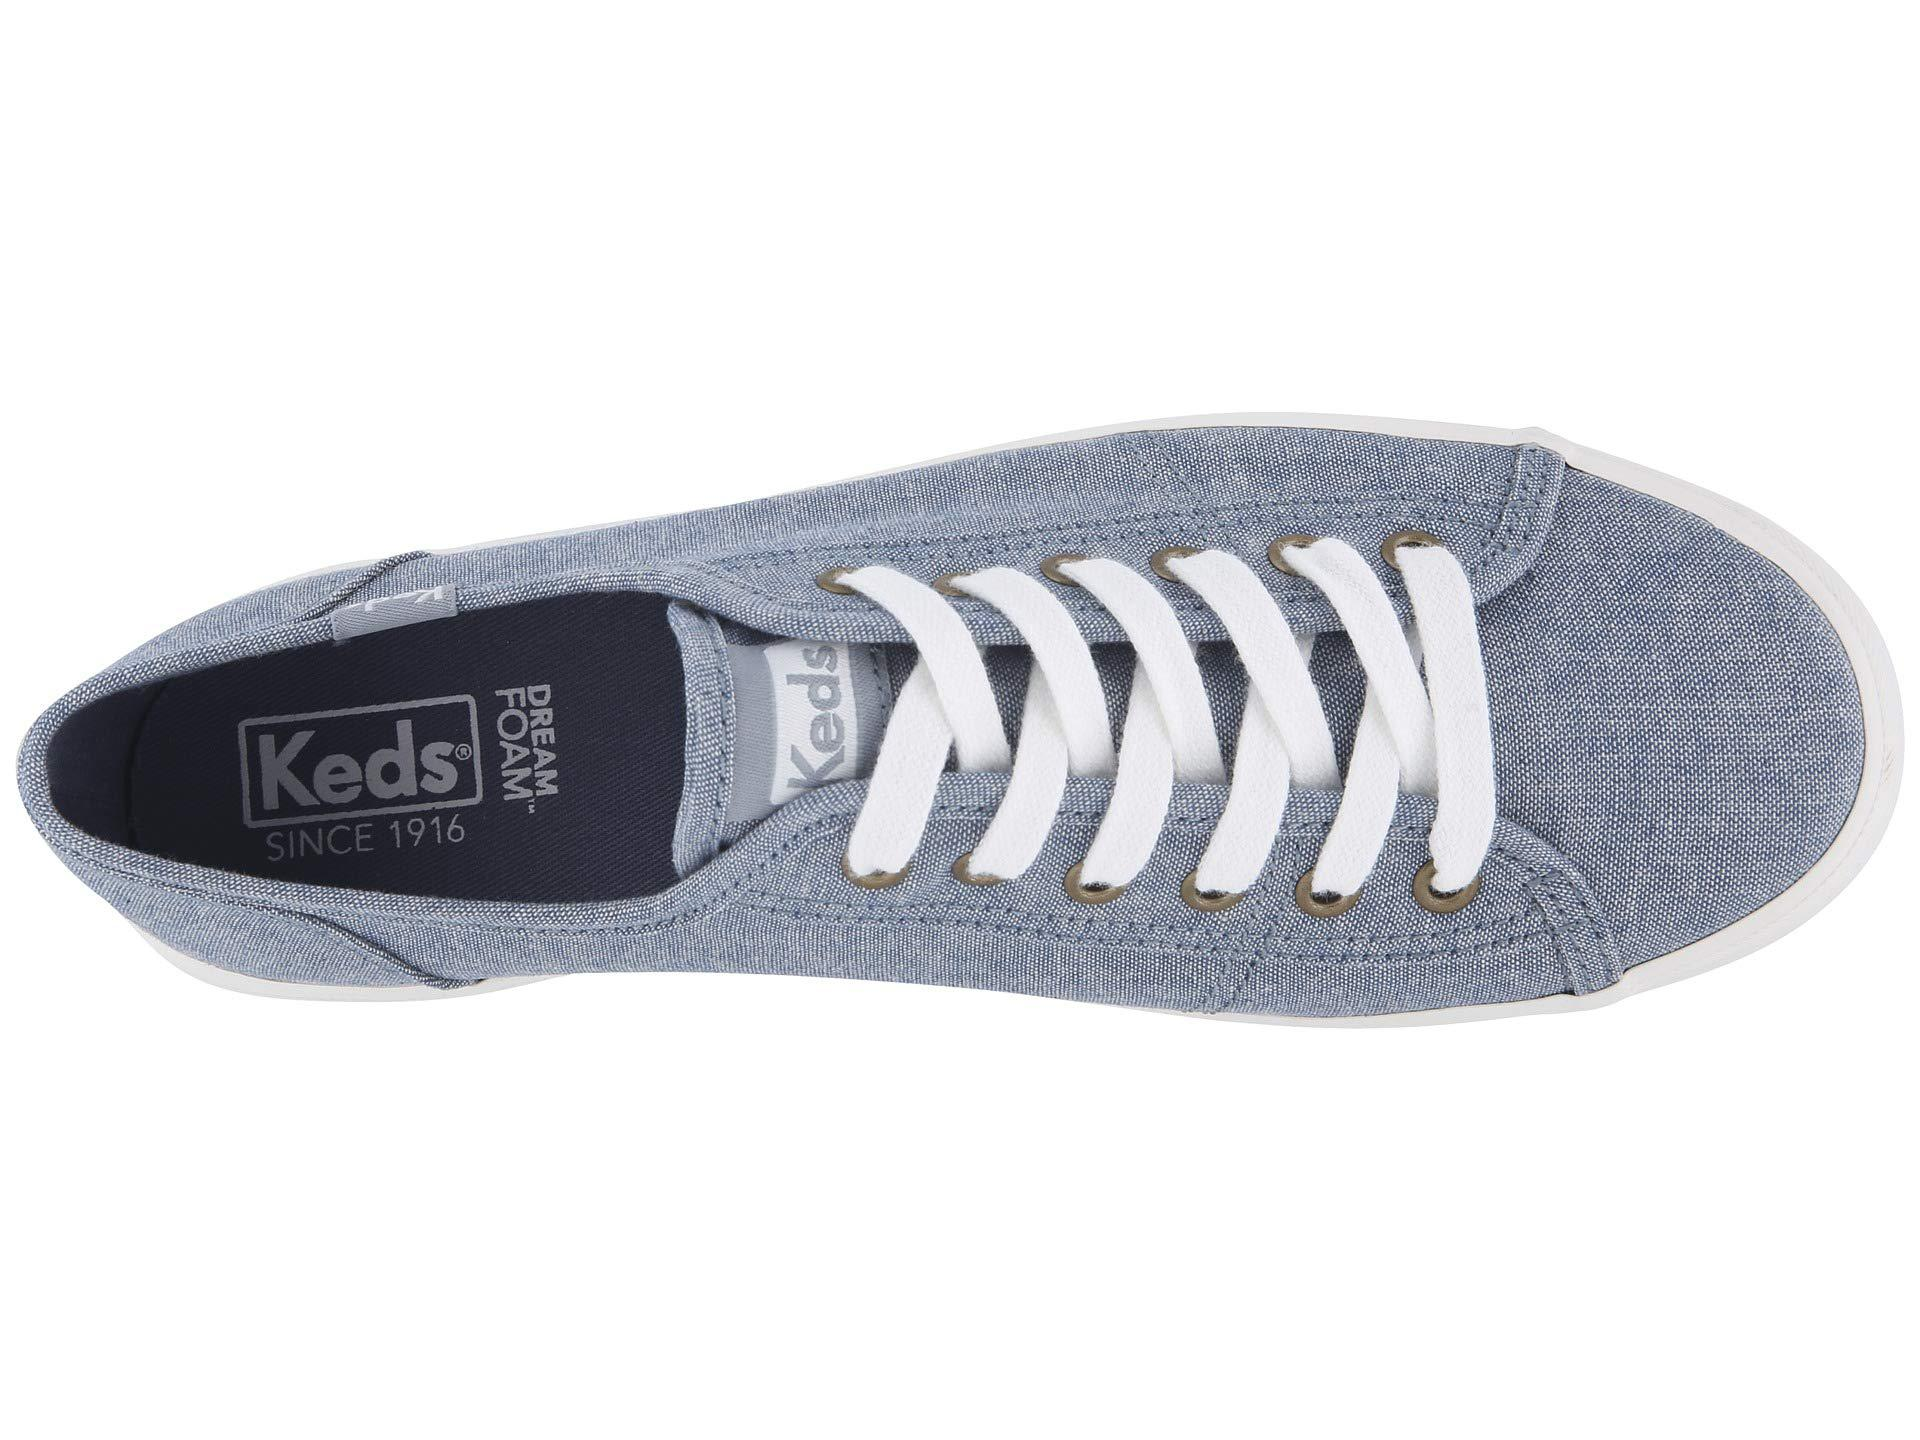 Keds - Kickstart Chambray (blue) Women s Lace Up Casual Shoes - Lyst. View  fullscreen 09fd974e8